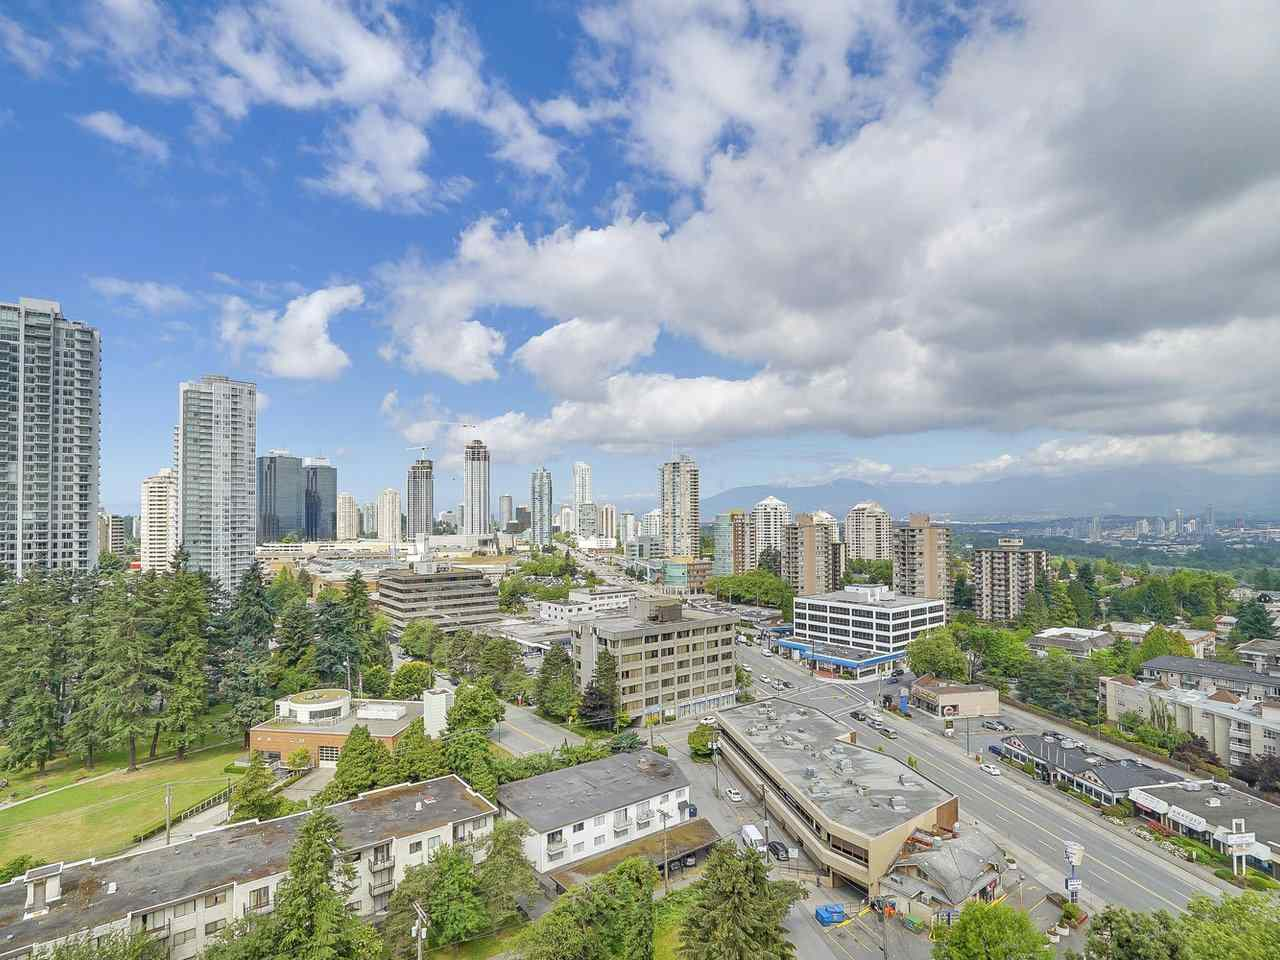 Condo Apartment at 1806 6540 BURLINGTON AVENUE, Unit 1806, Burnaby South, British Columbia. Image 1